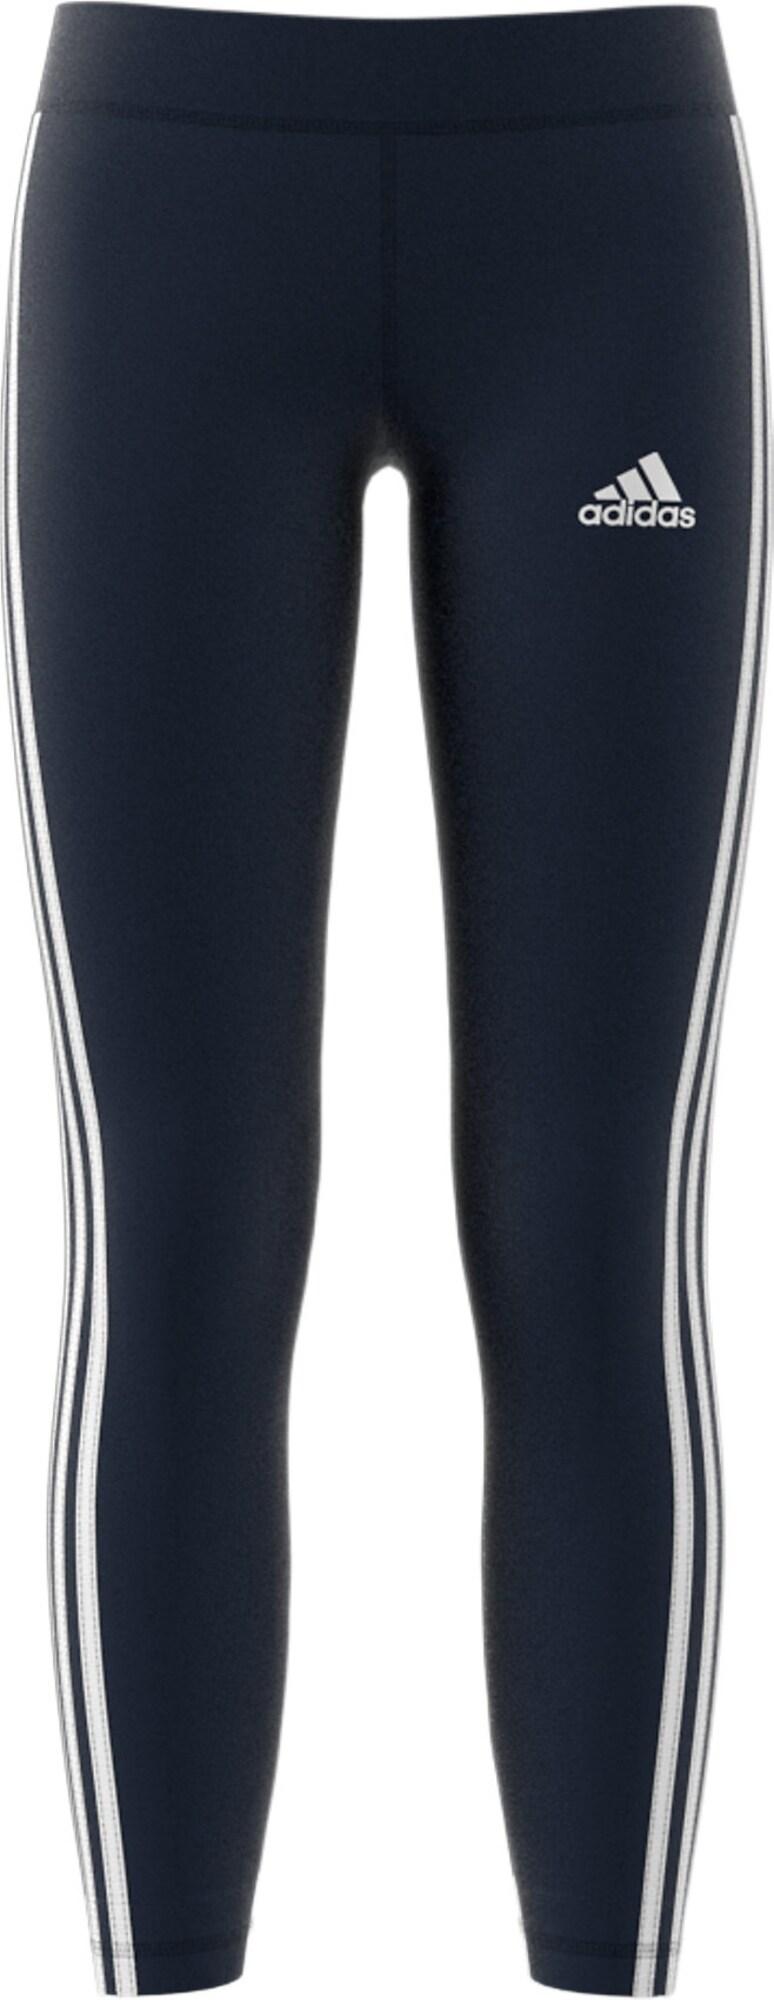 ADIDAS PERFORMANCE Sportinės kelnės 'YG TR EQ 3S L T' tamsiai mėlyna / balta